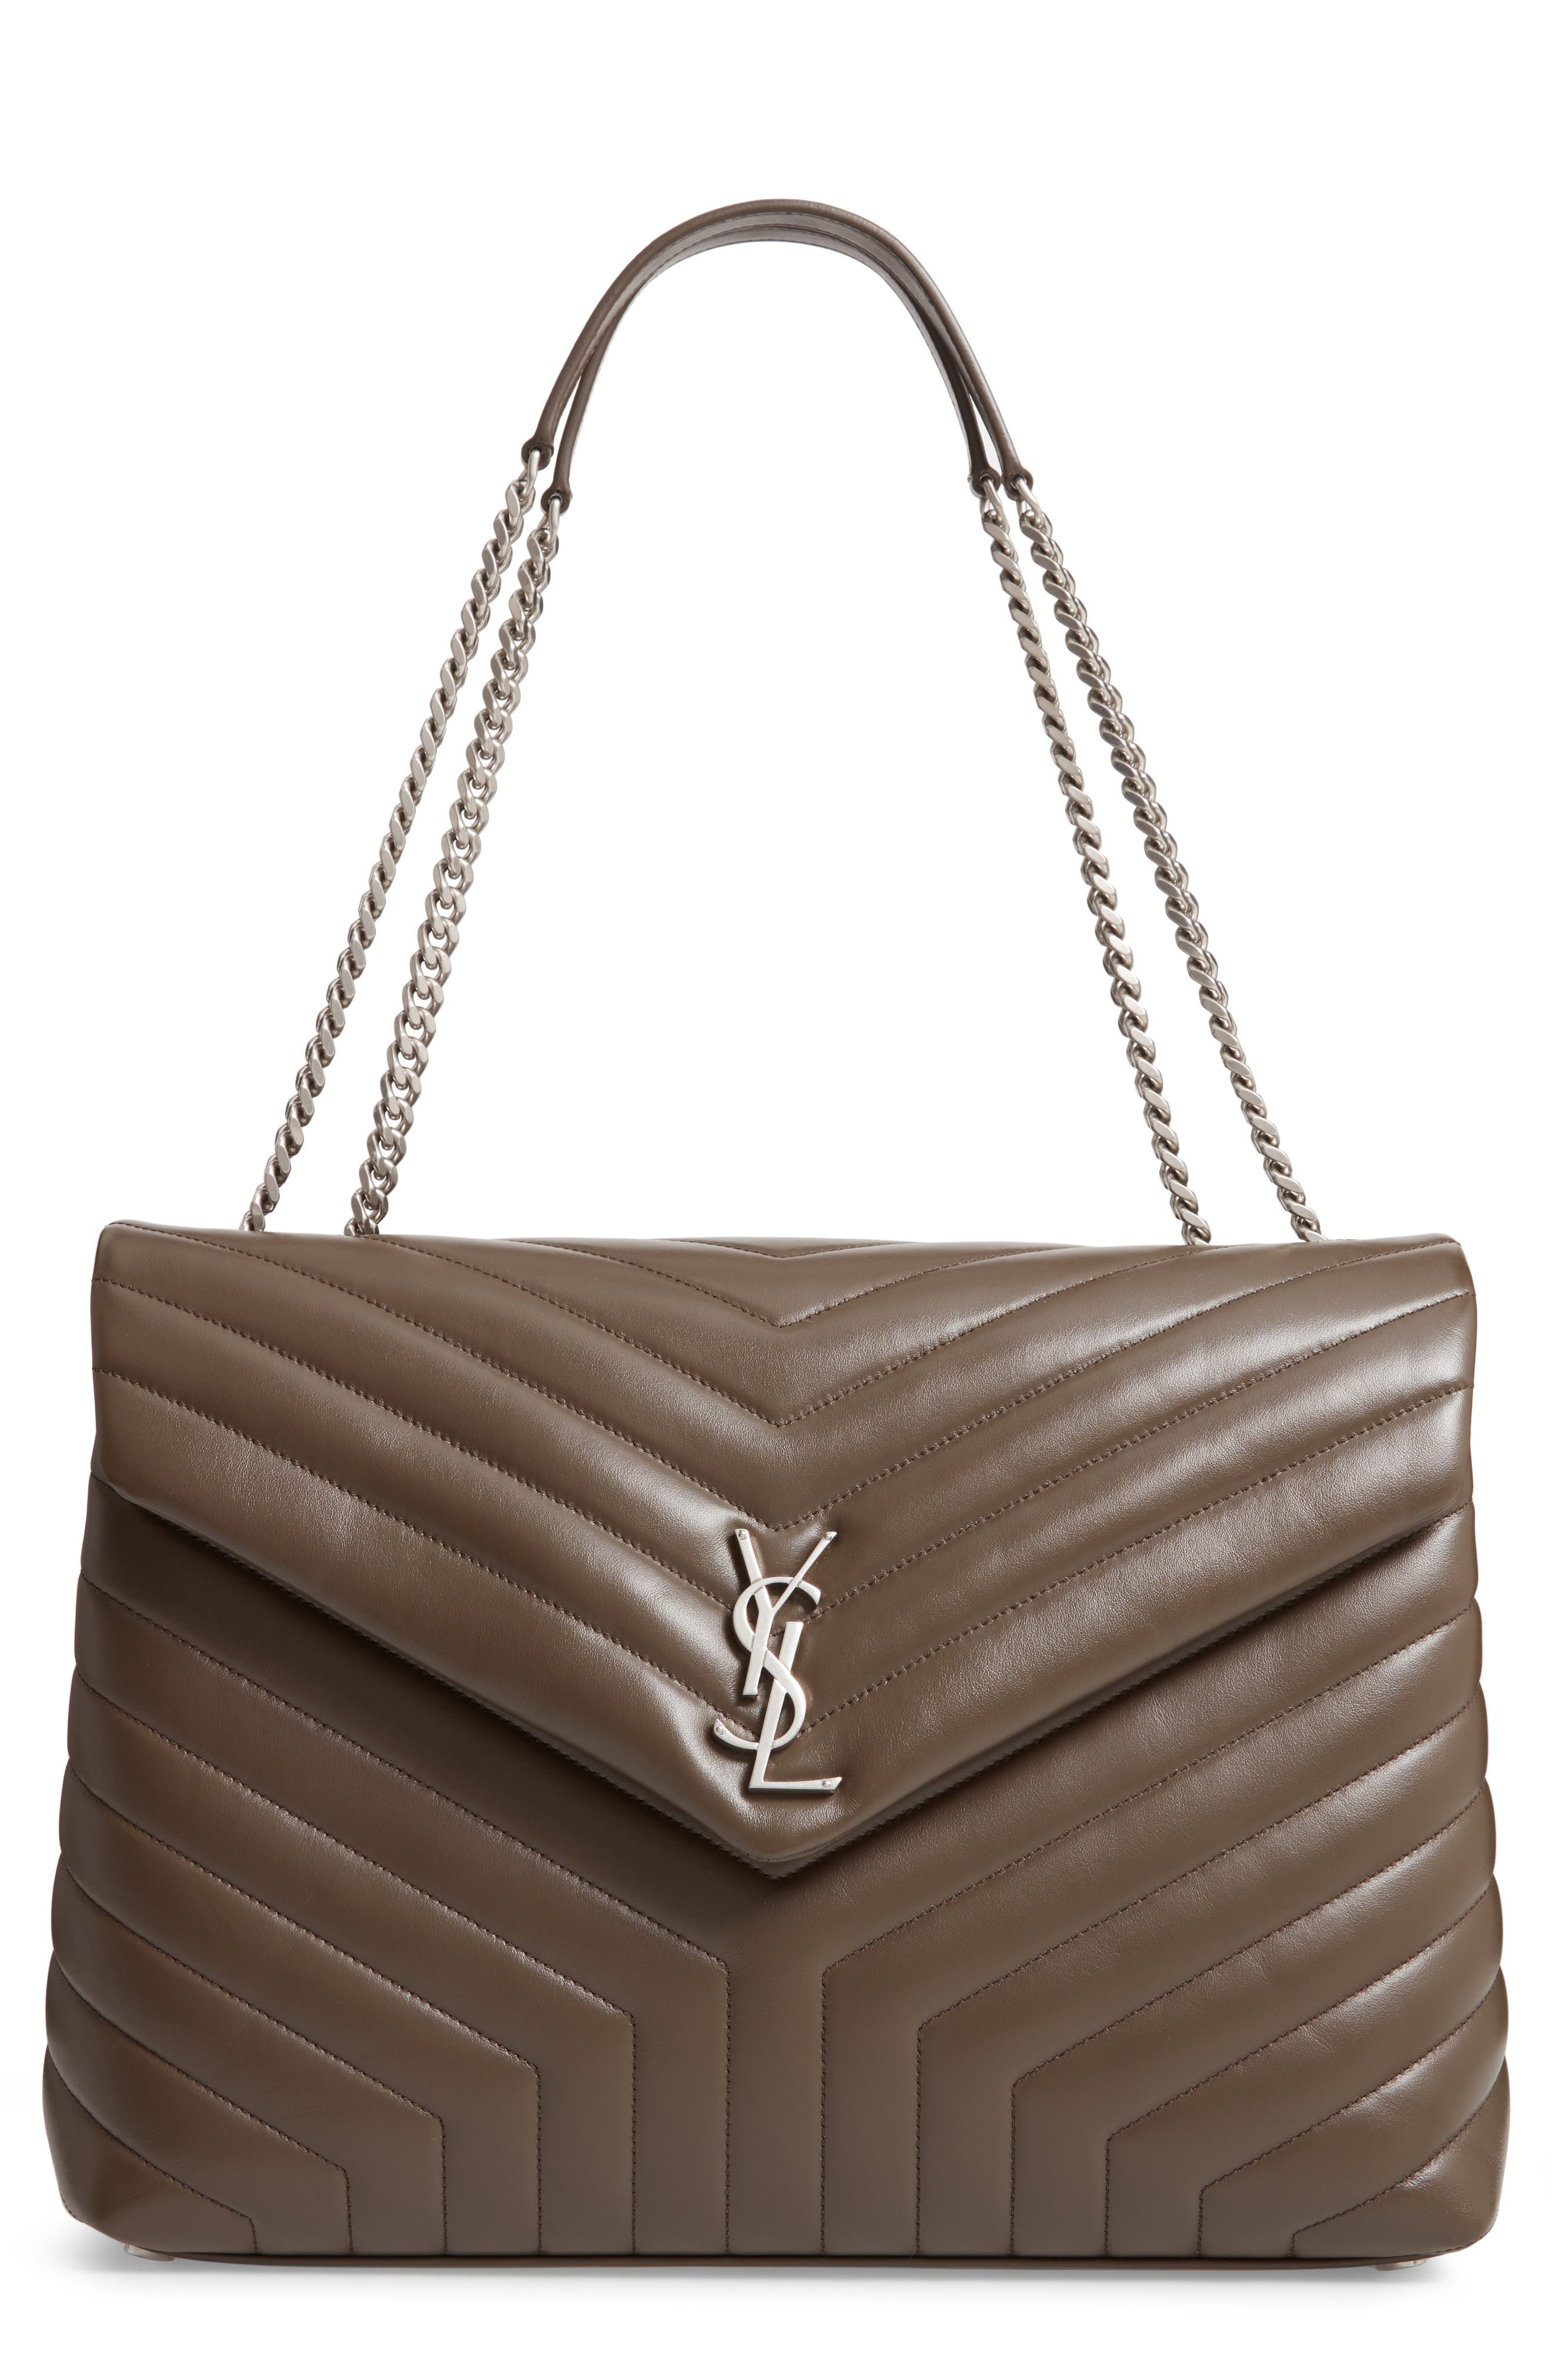 Large Loulou Matelassé Leather Shoulder Bag,                             Main thumbnail 1, color,                             FAGGIO/ FAGGIO